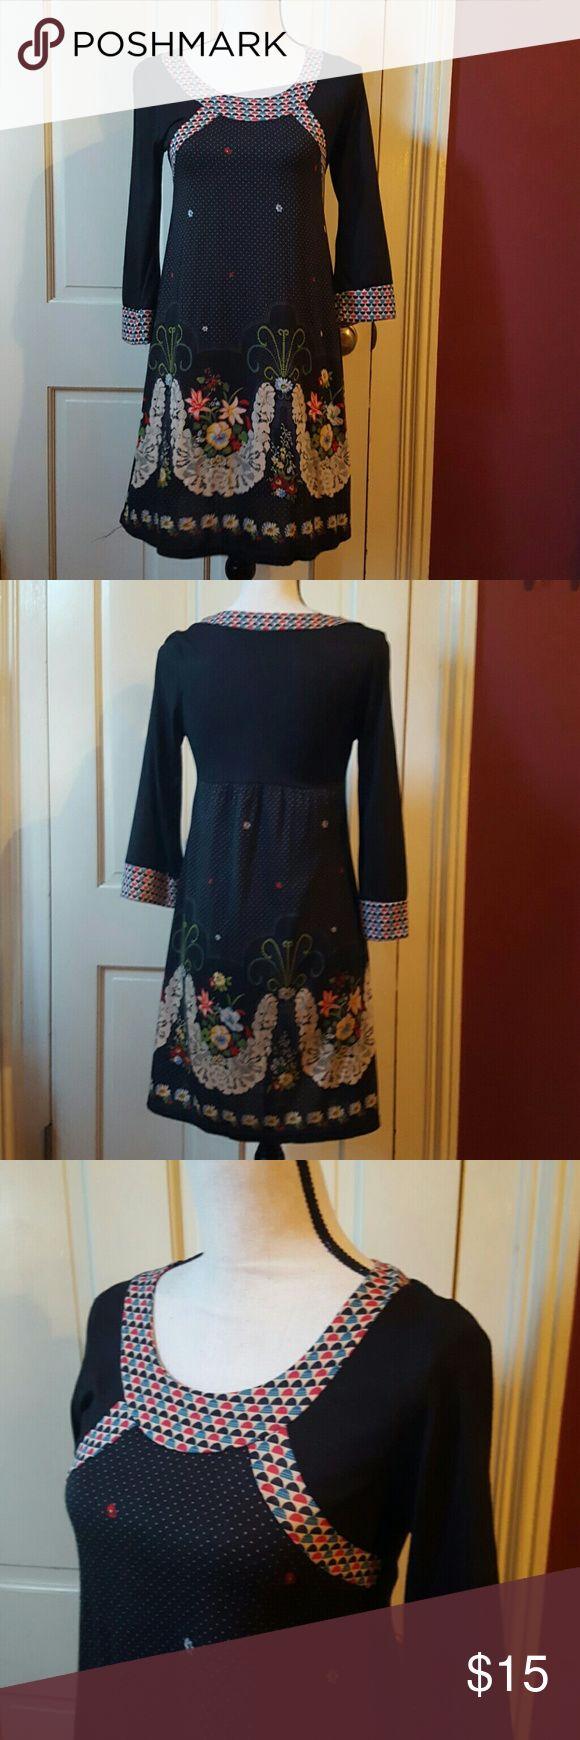 Cute boho floaty dress S Floaty little dress. Be really cute with tall boots. S Dari meya Dresses Mini